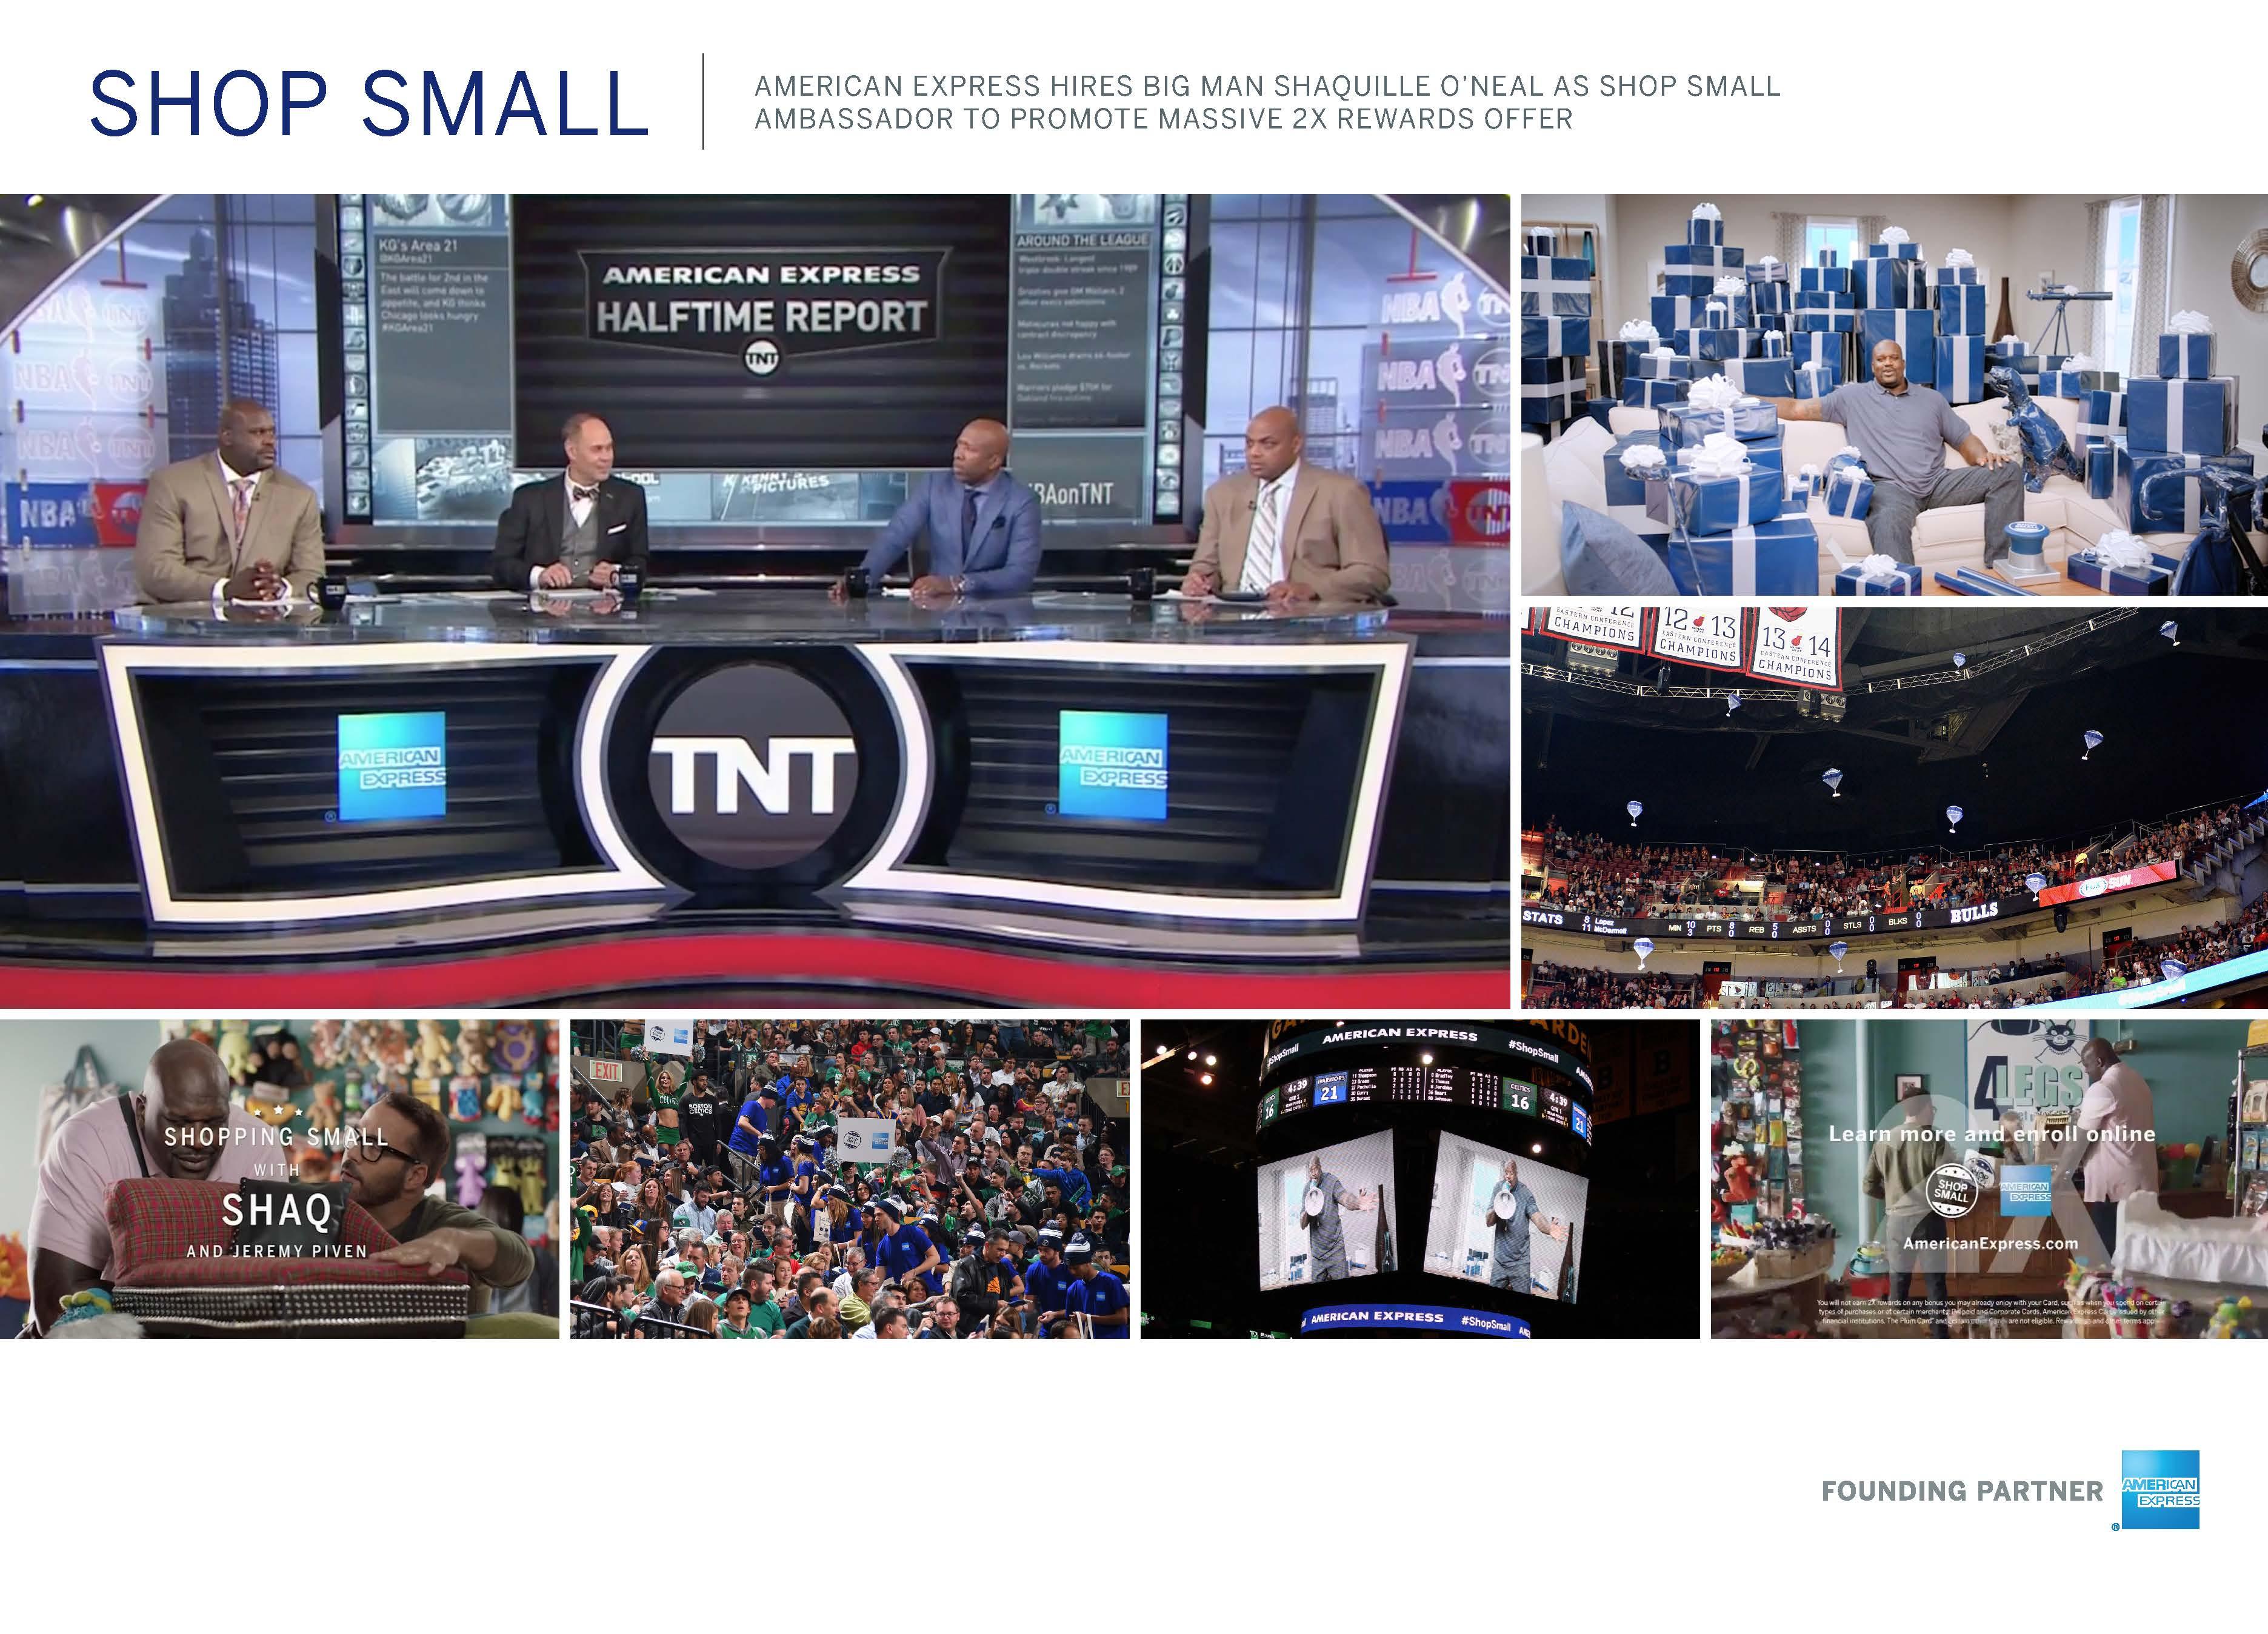 American Express Shop Small for 2X Rewards Thumbnail